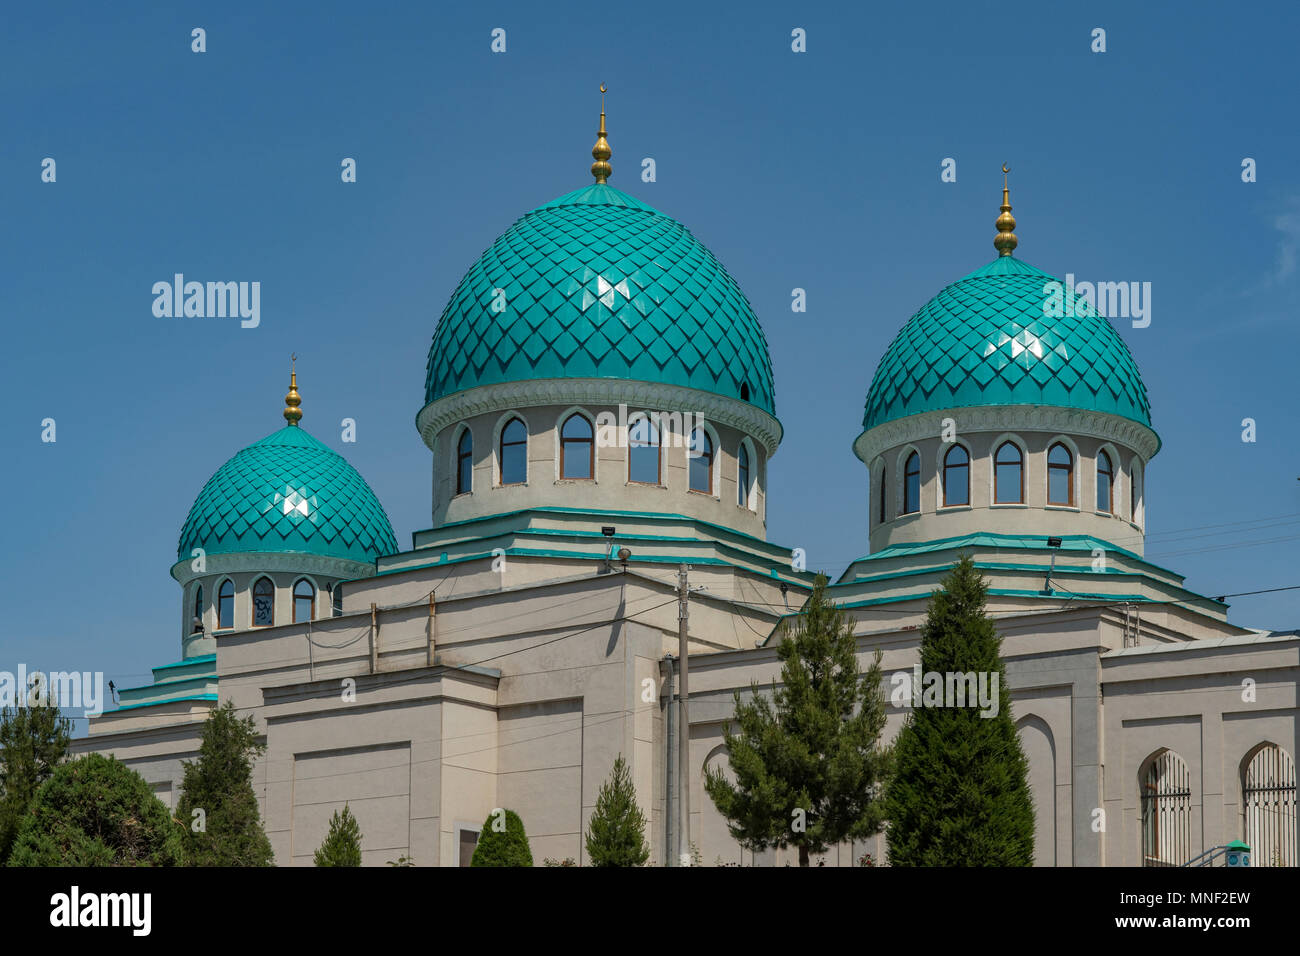 Juma Mosque, Tashkent, Uzbekistan - Stock Image